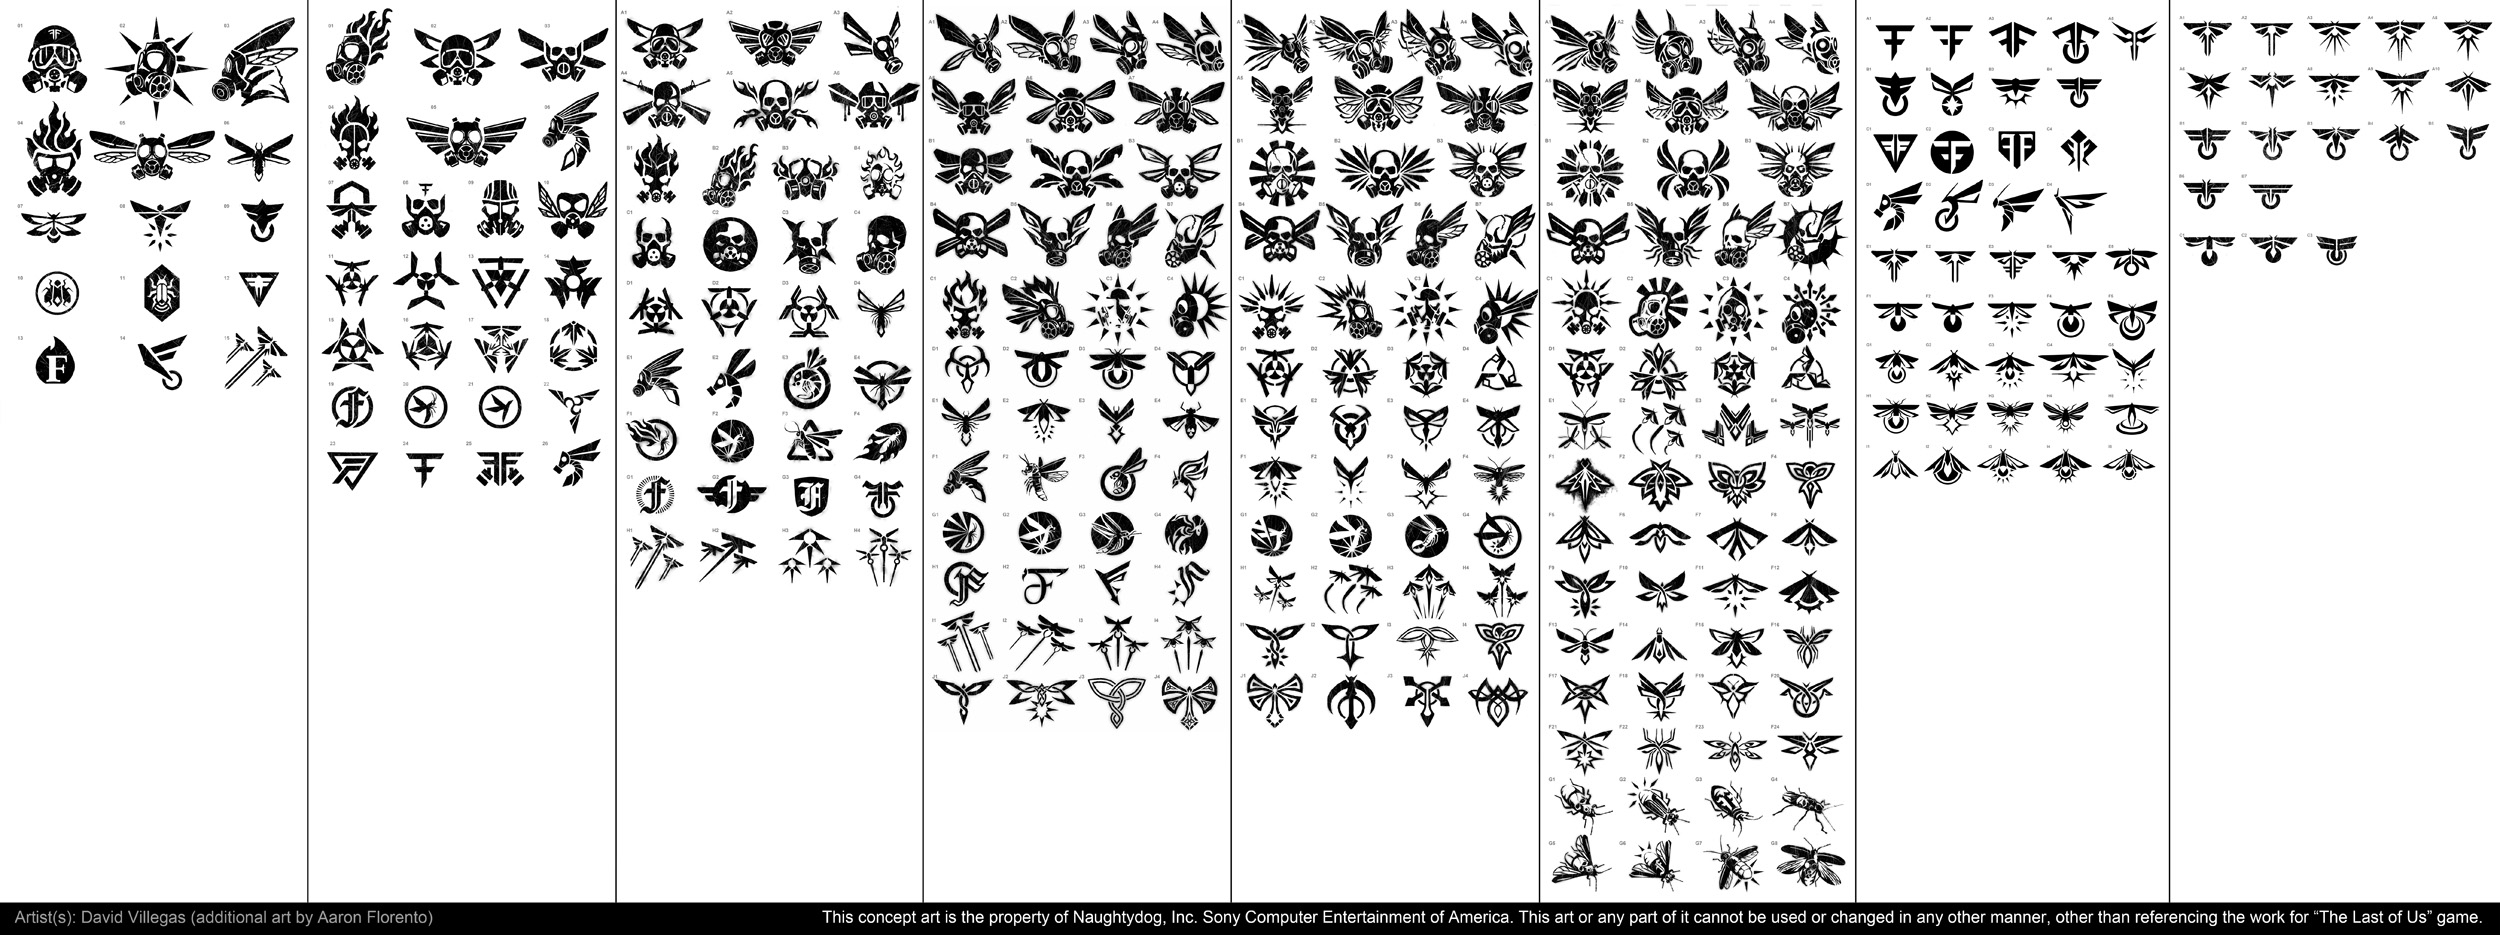 nd_120809_logo-firefly-evolution